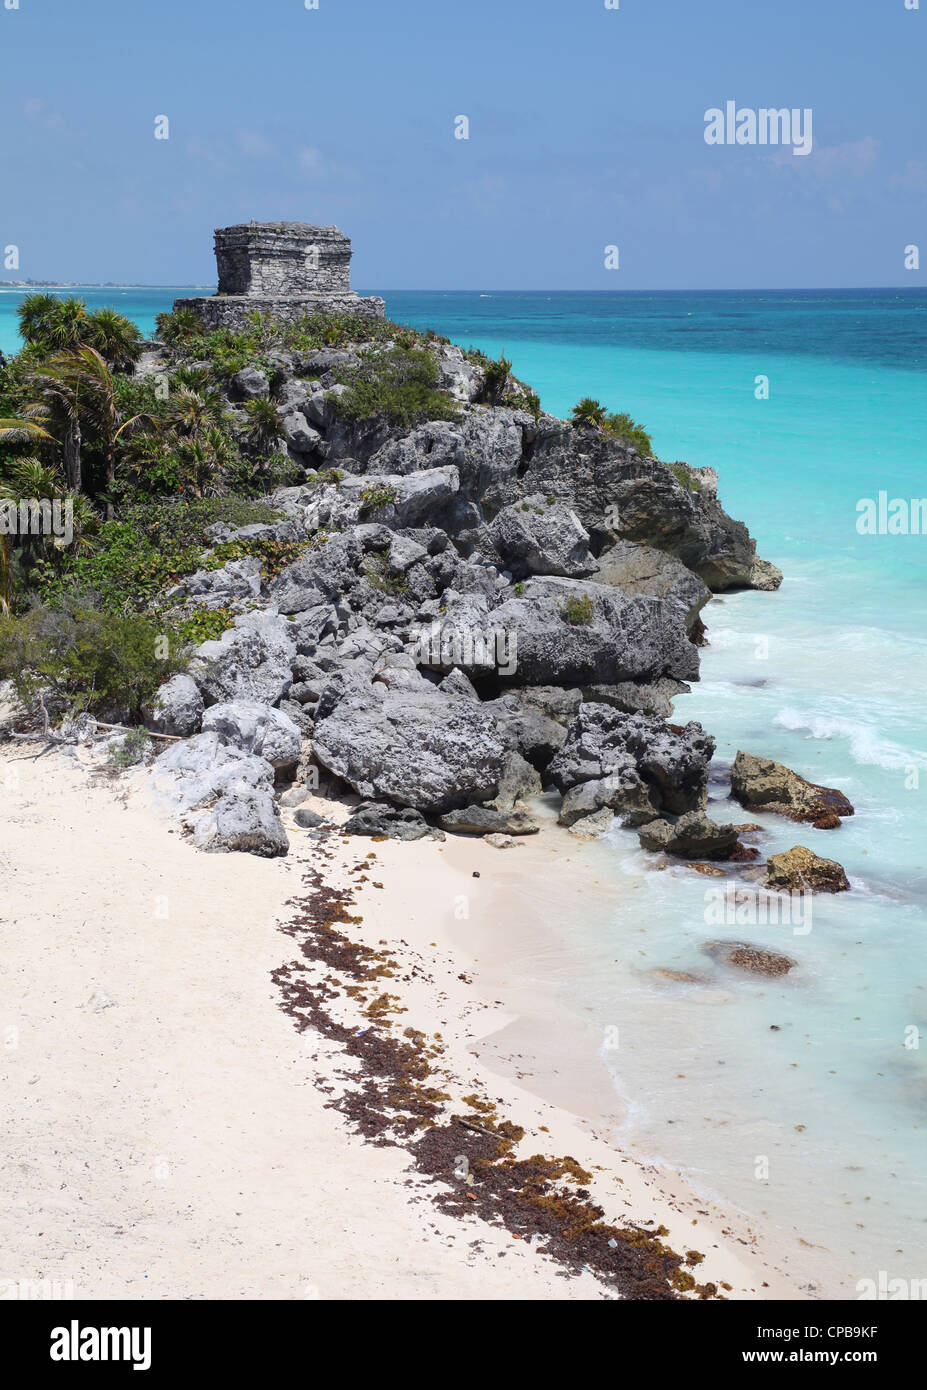 Tulum ruins, Mexico, Quintana Roo, Yucatan - Stock Image